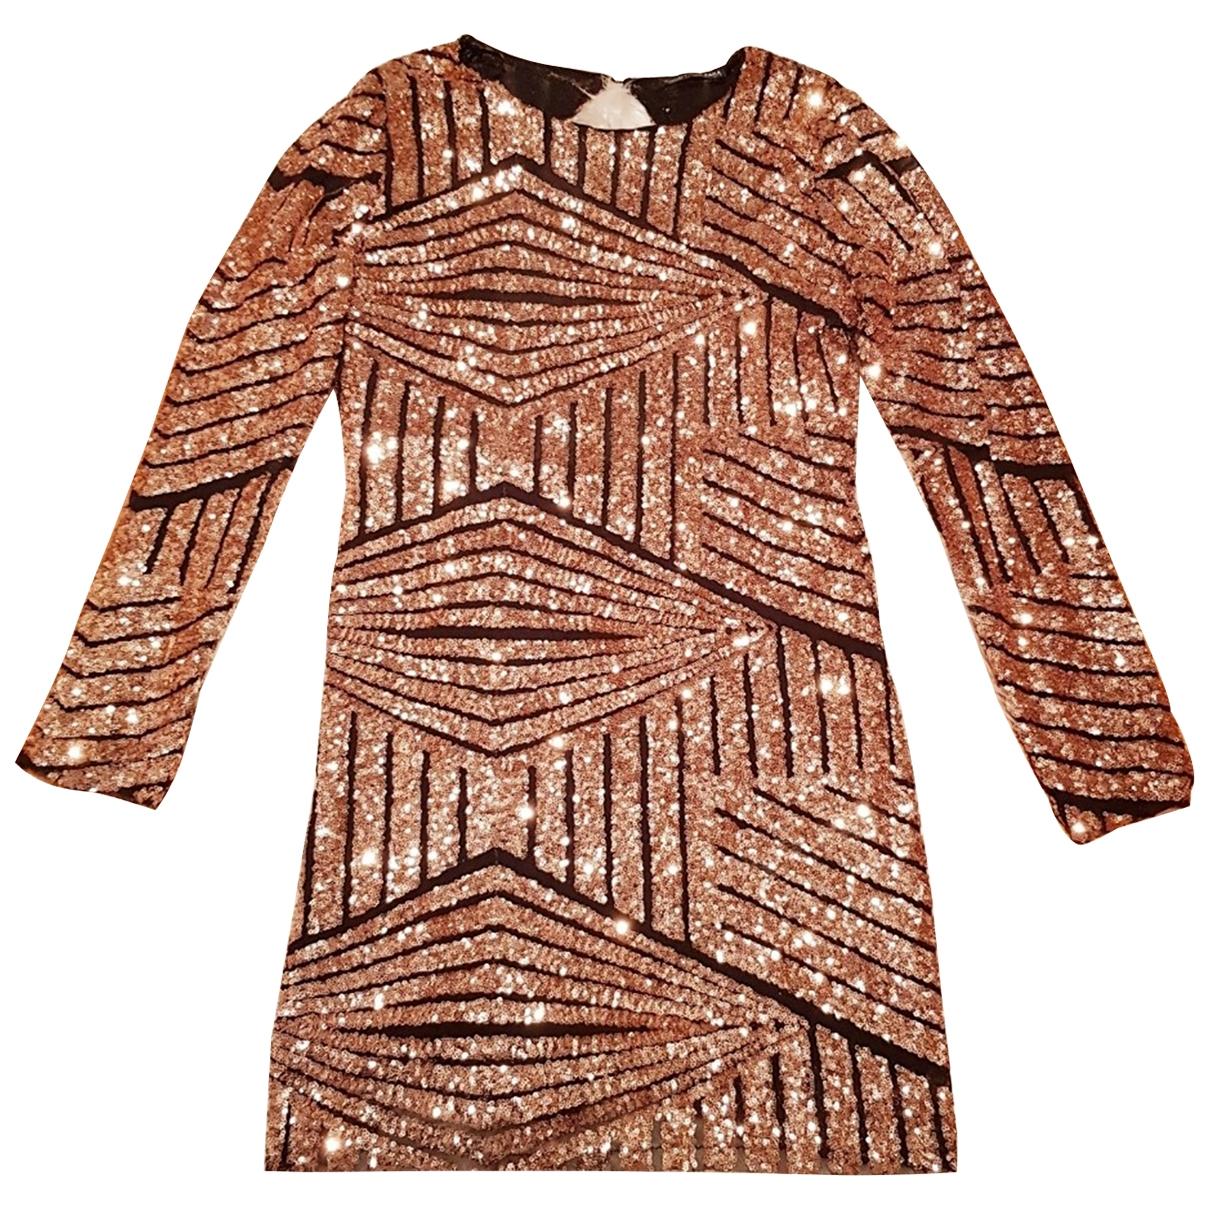 Zara \N Gold Glitter dress for Women L International